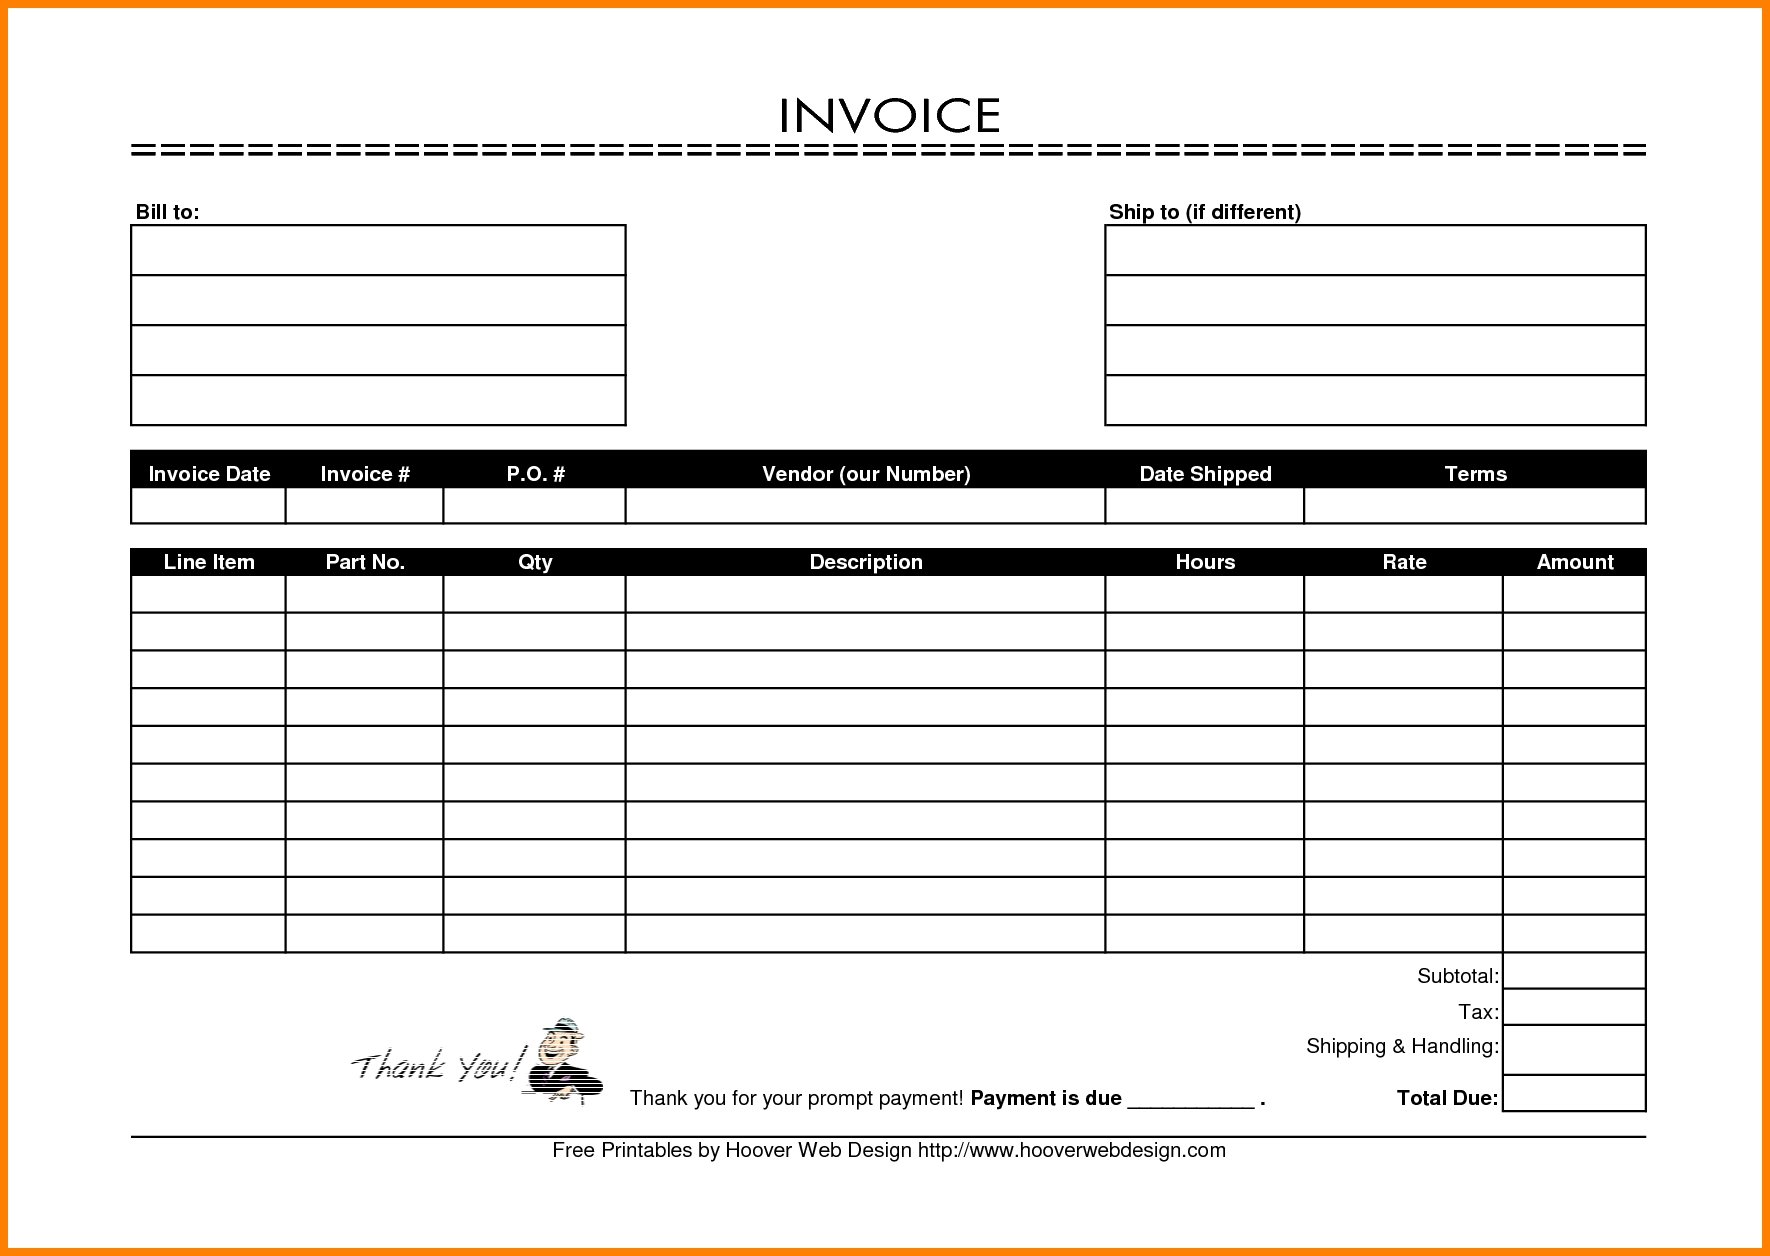 free invoice printable free invoice printable free printable invoice templates free 1770 X 1256